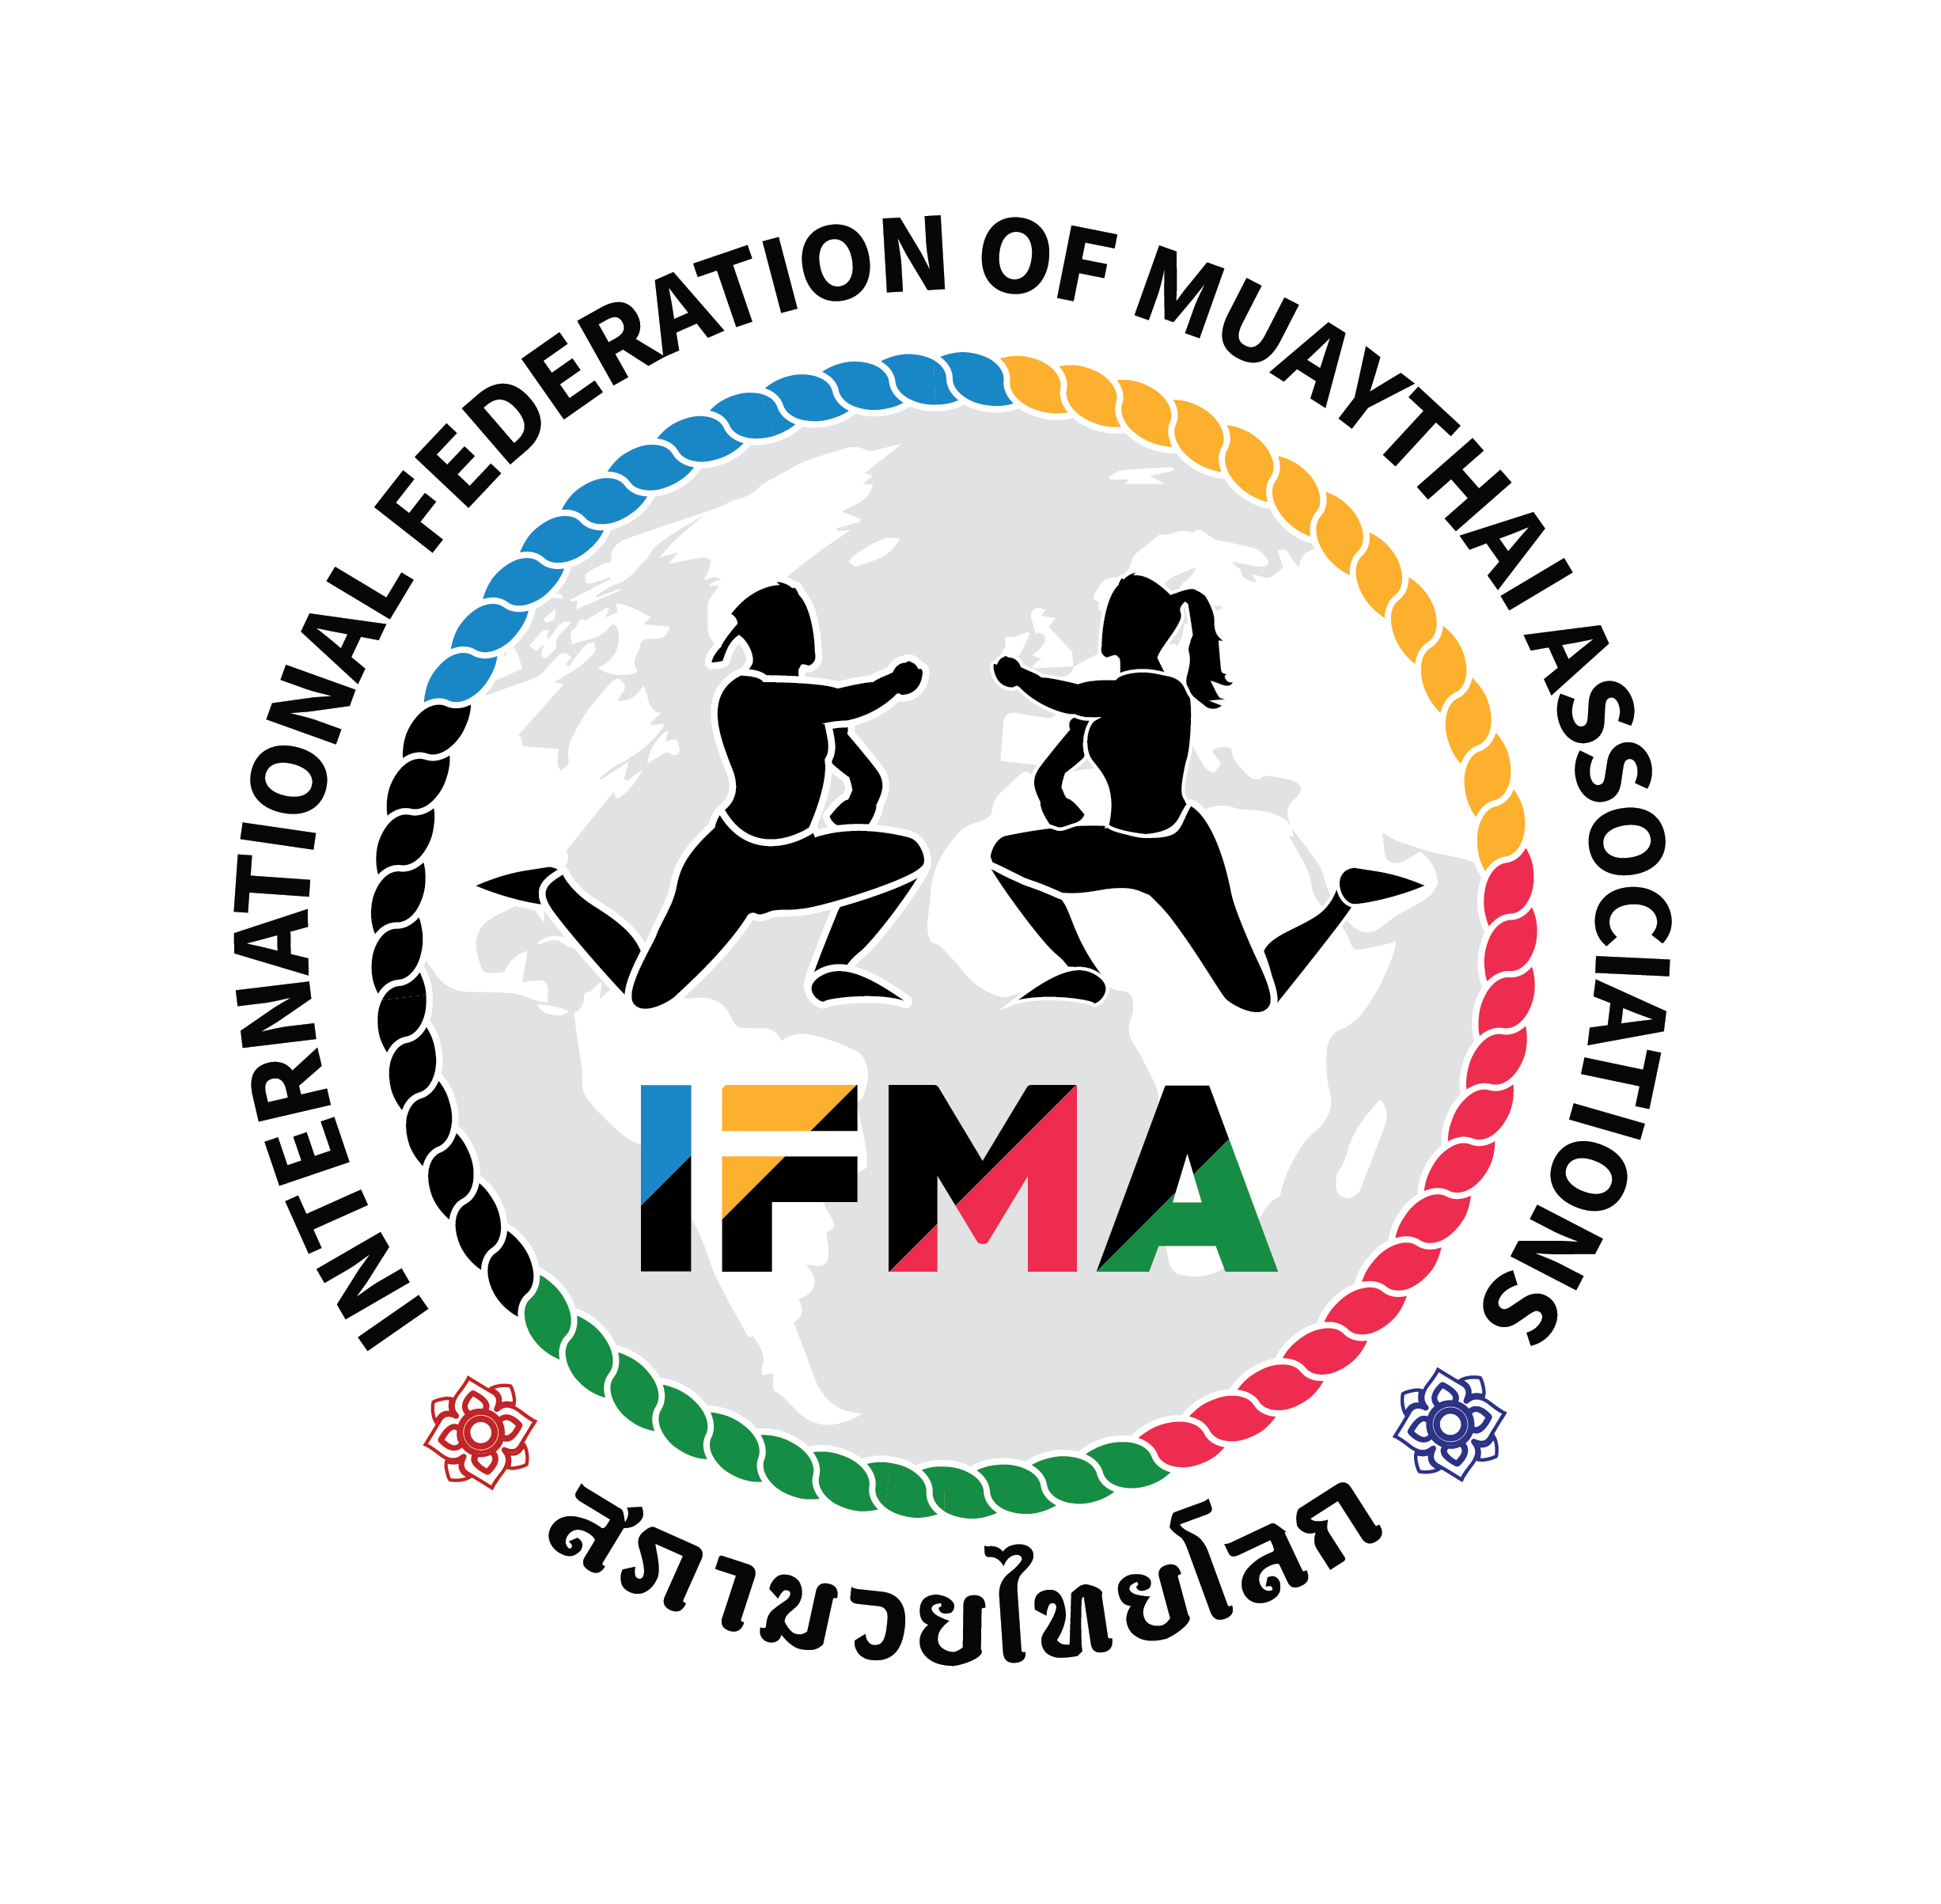 INTERNATIONAL FEDERATION OF MUAYTHAI AMATEUR